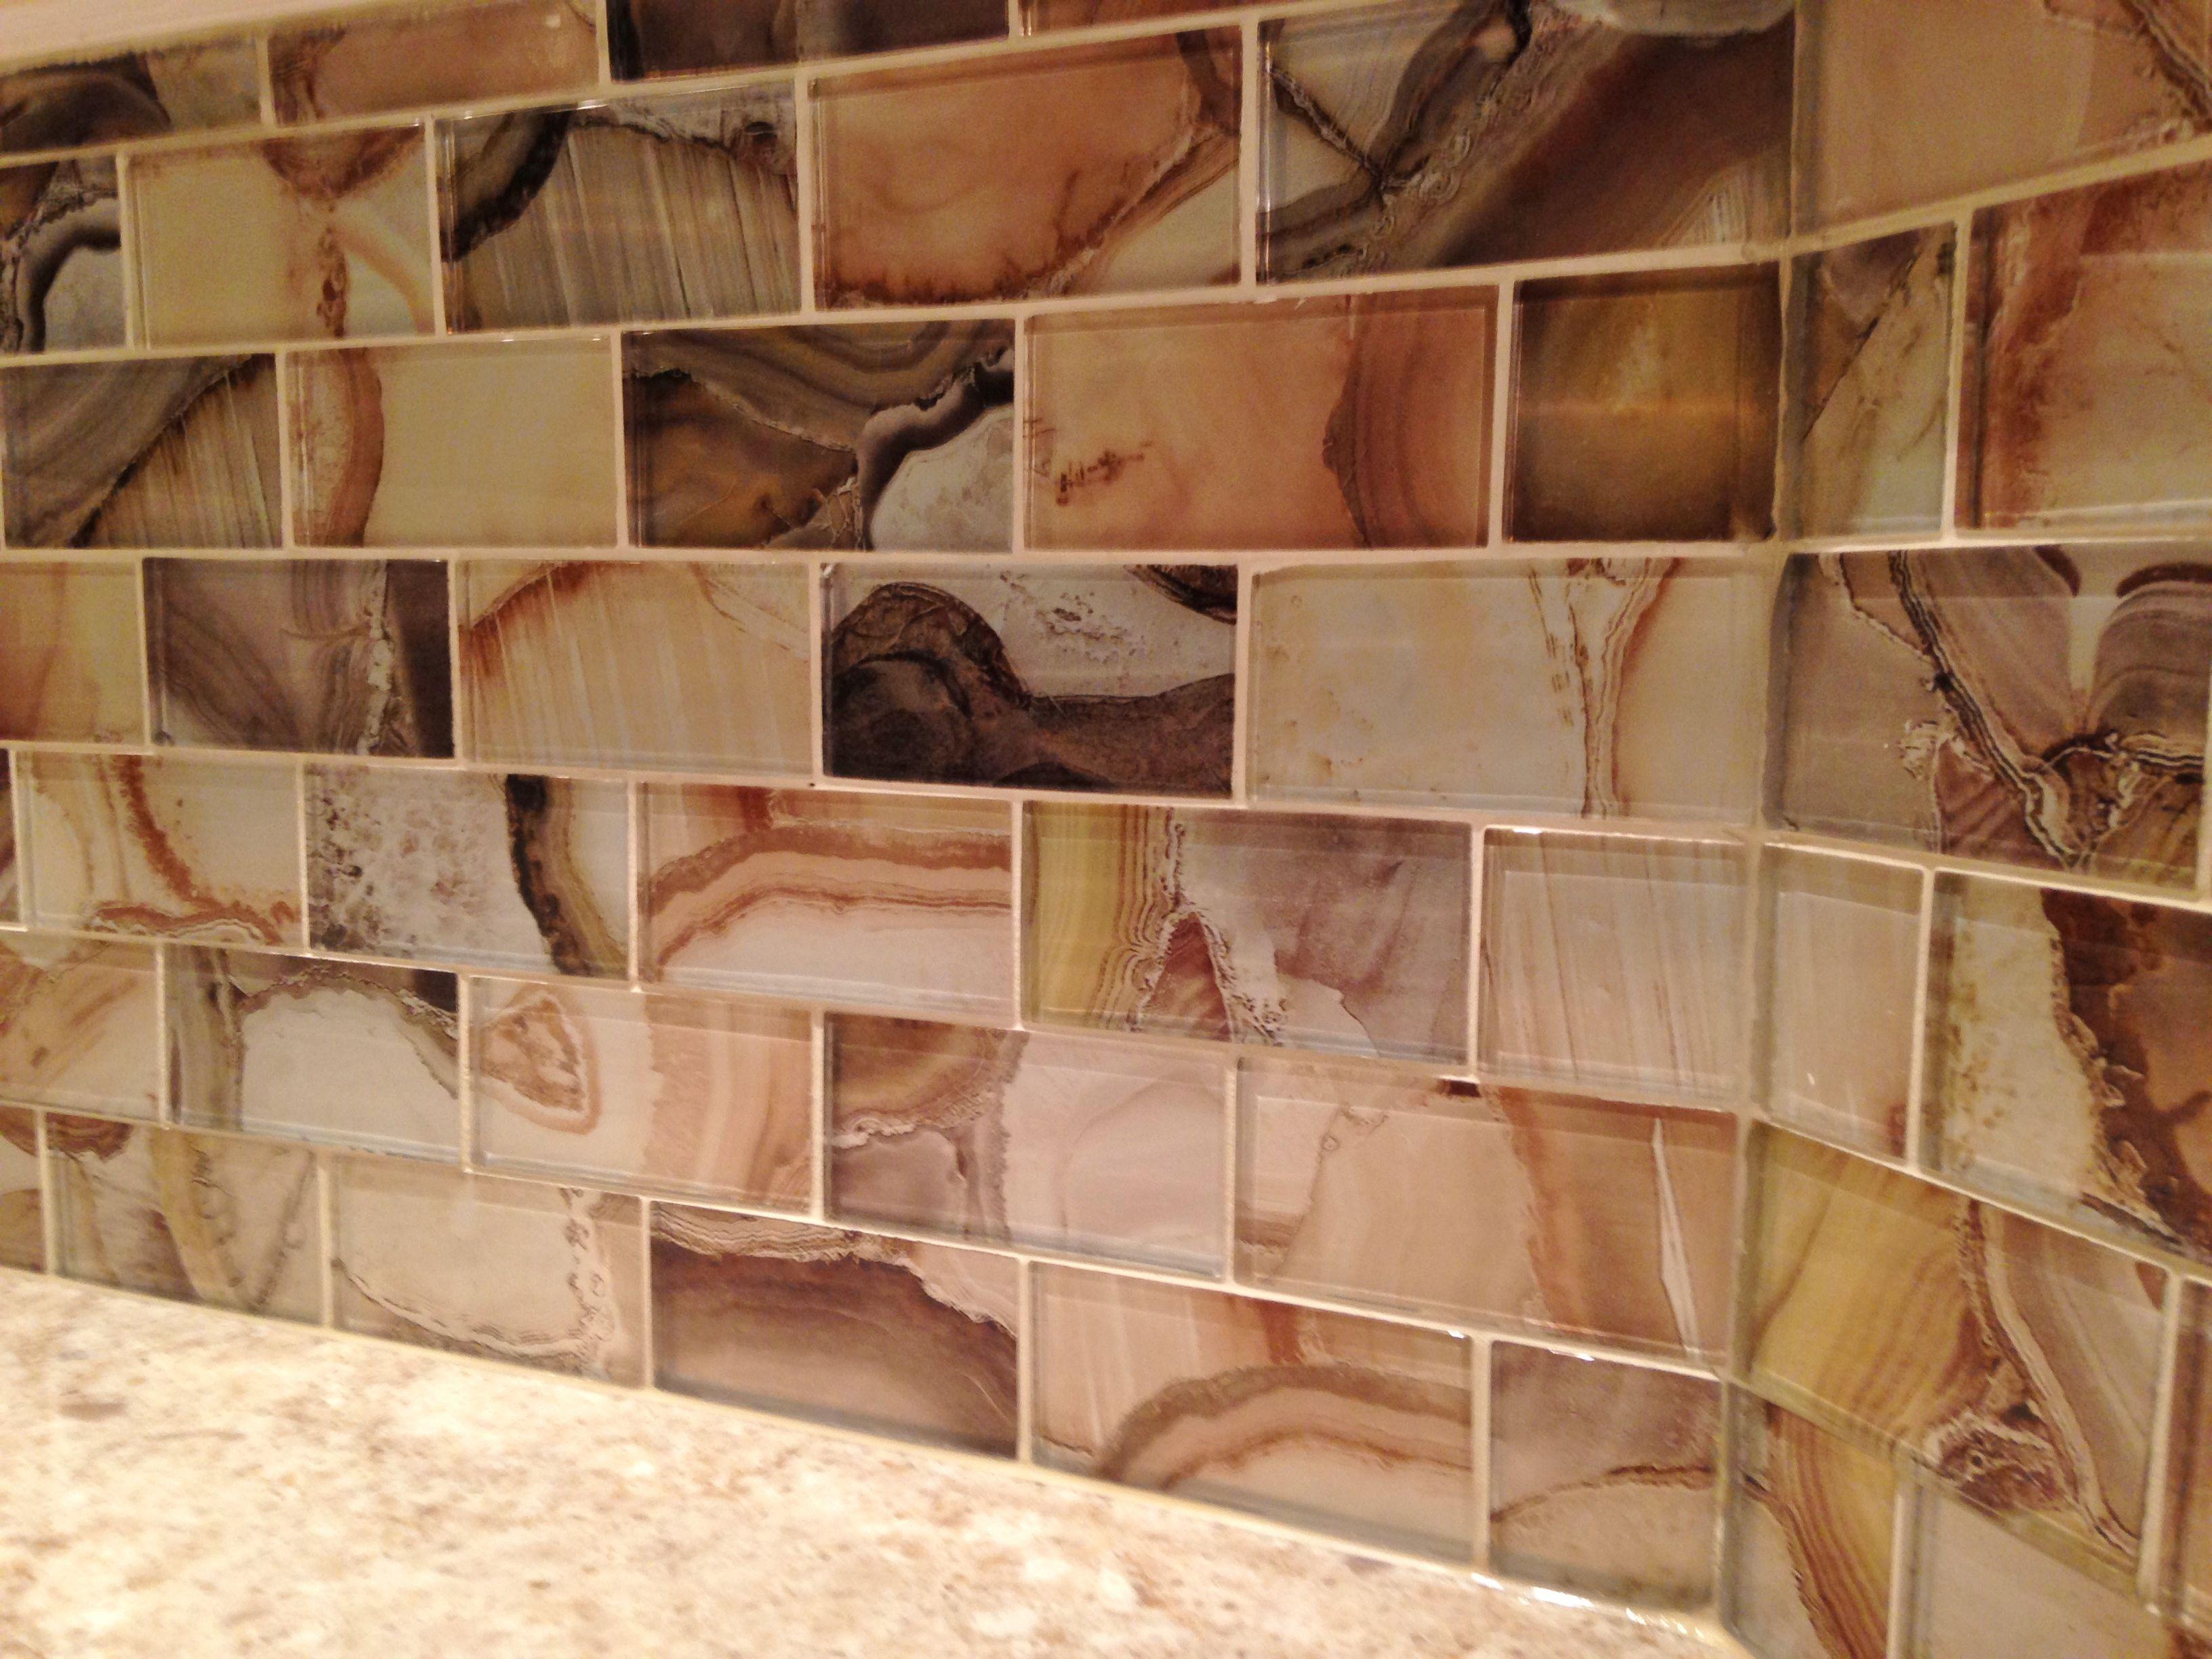 Kitchen Backsplash Installation By M A K Construction Services Elida Ceramica Volcanic Essence